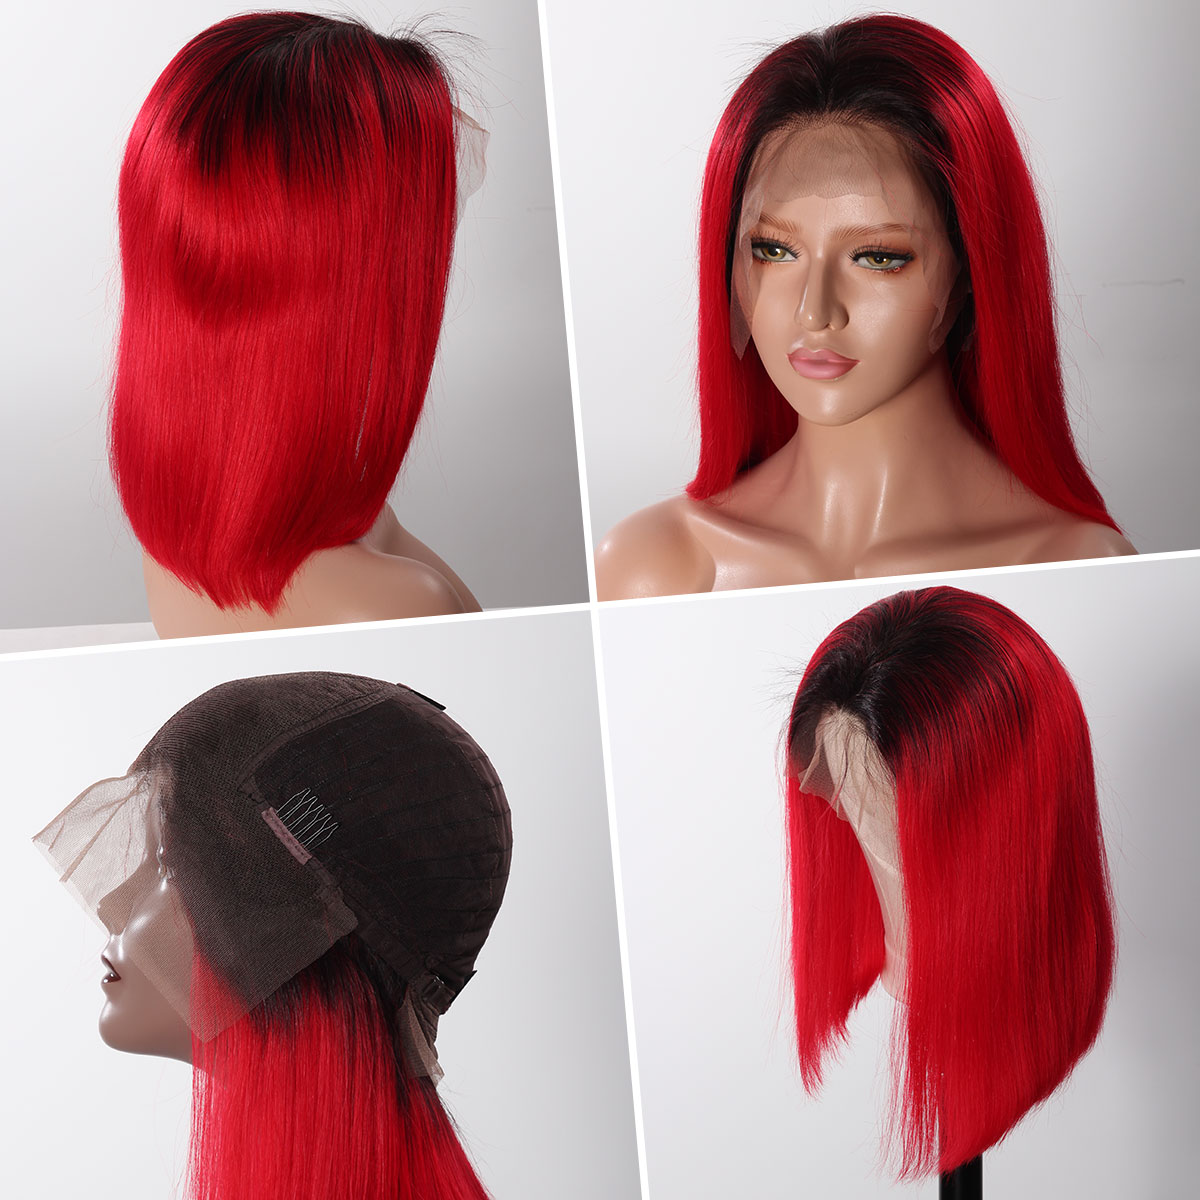 Colorful 13x6 Short Bob Straight Hair - 1B/Red